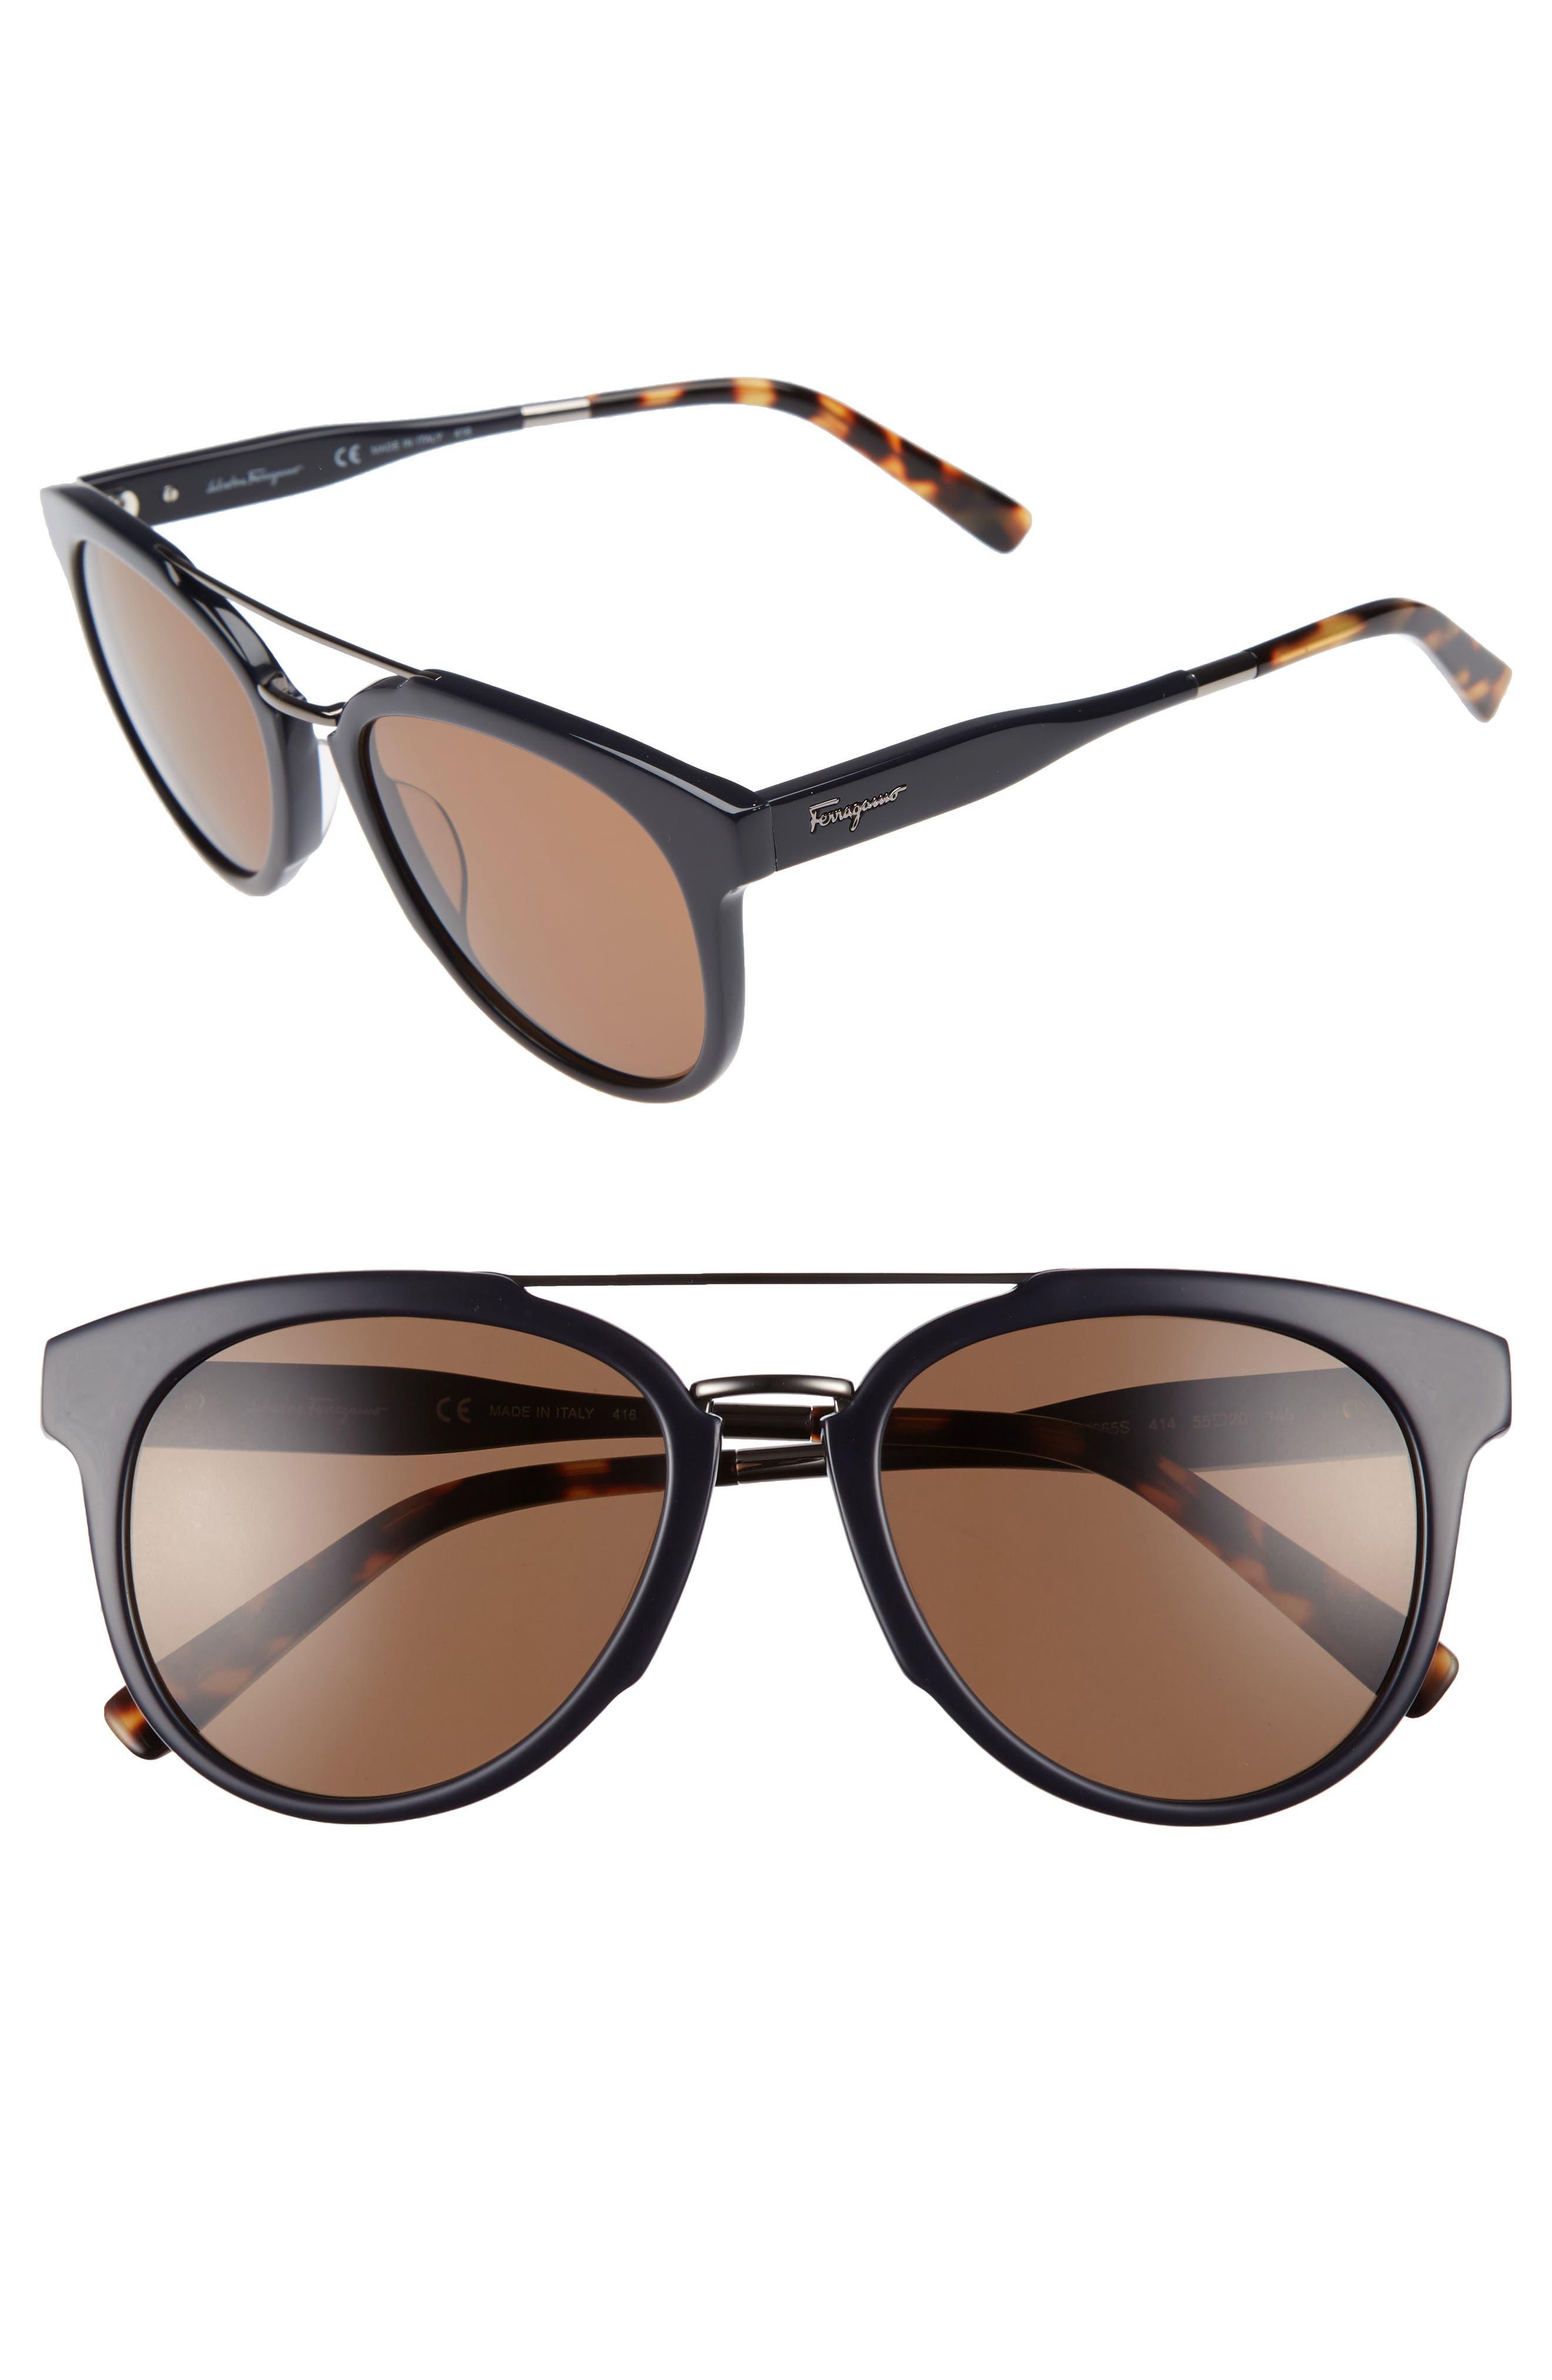 Salvatore Ferragamo Retro 55mm Sunglasses